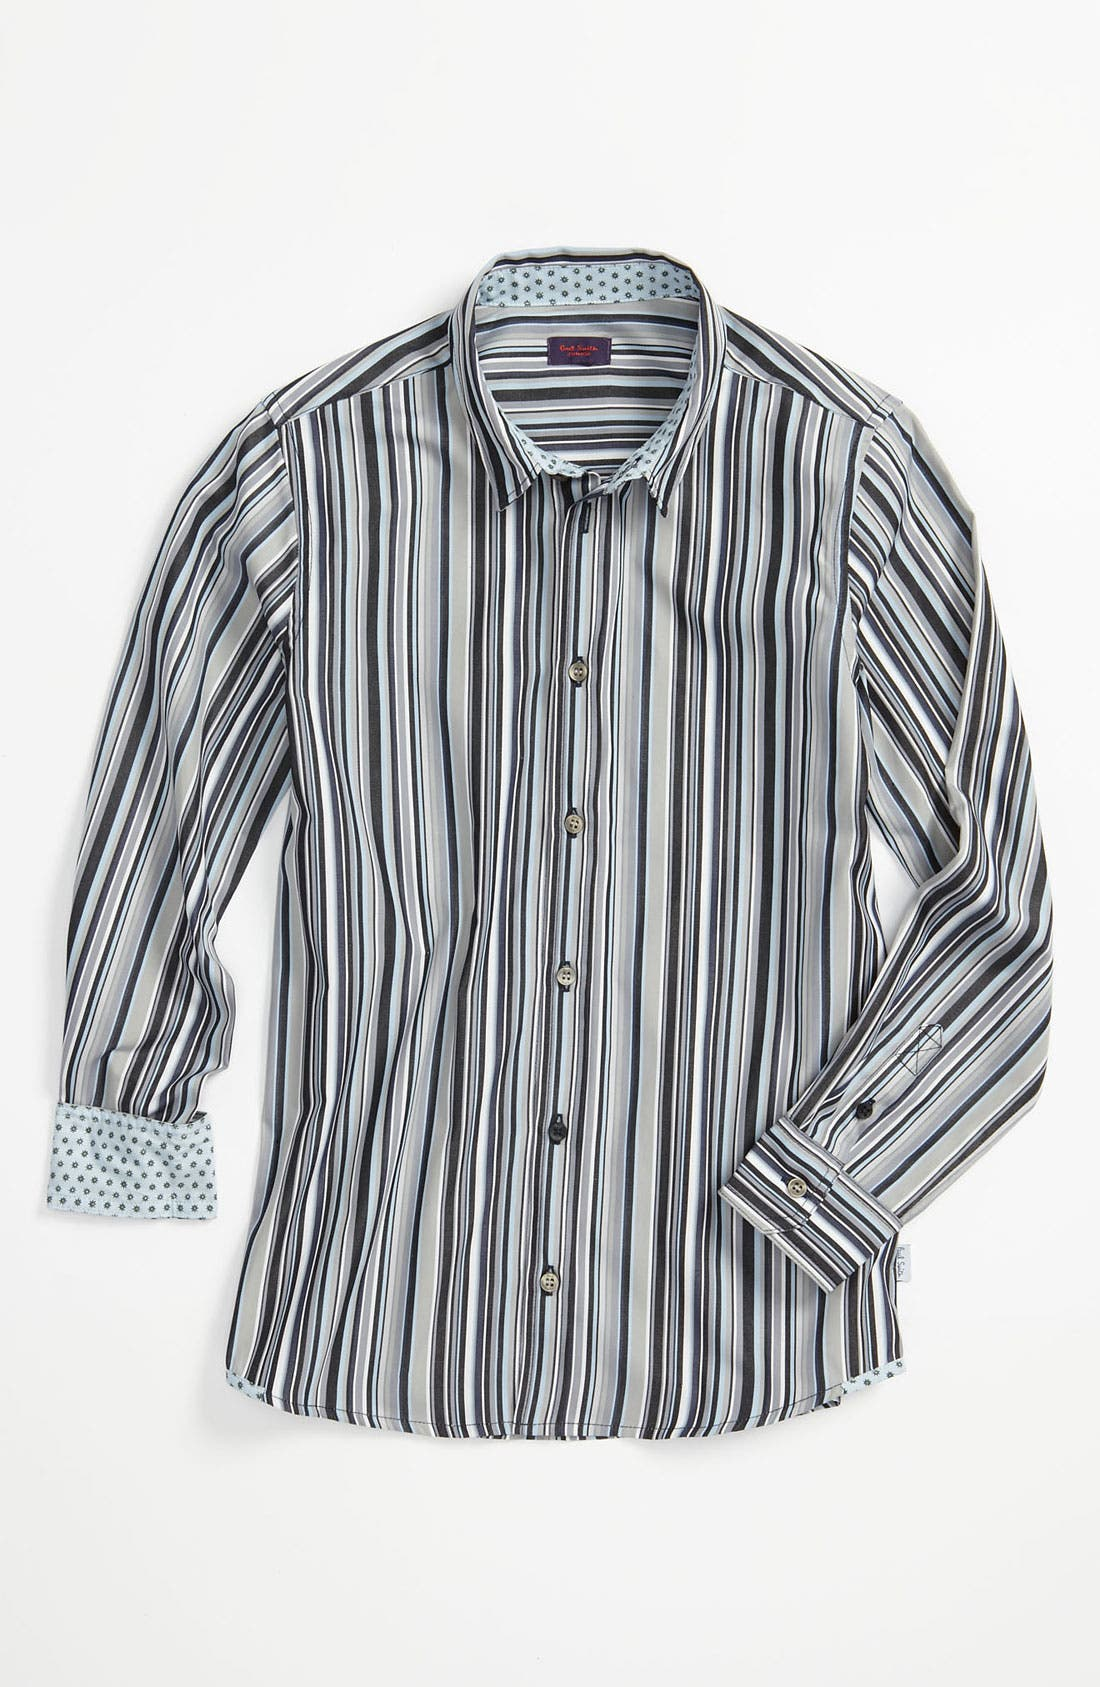 Main Image - Paul Smith Junior 'Cartland' Woven Shirt (Big Boys)